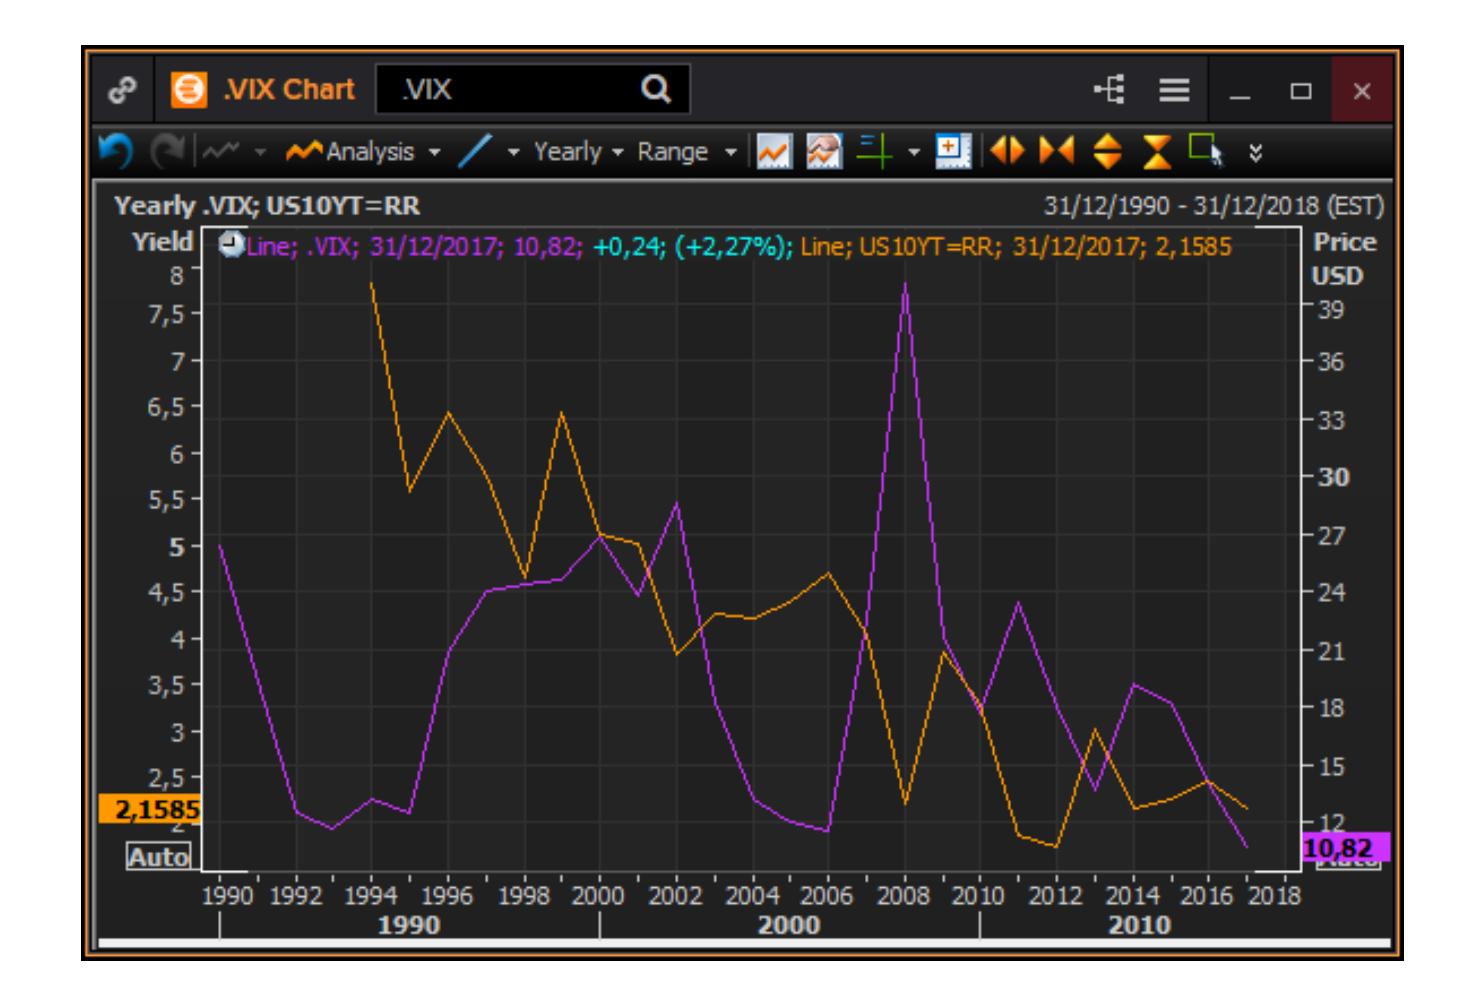 VIX - Volatilidad